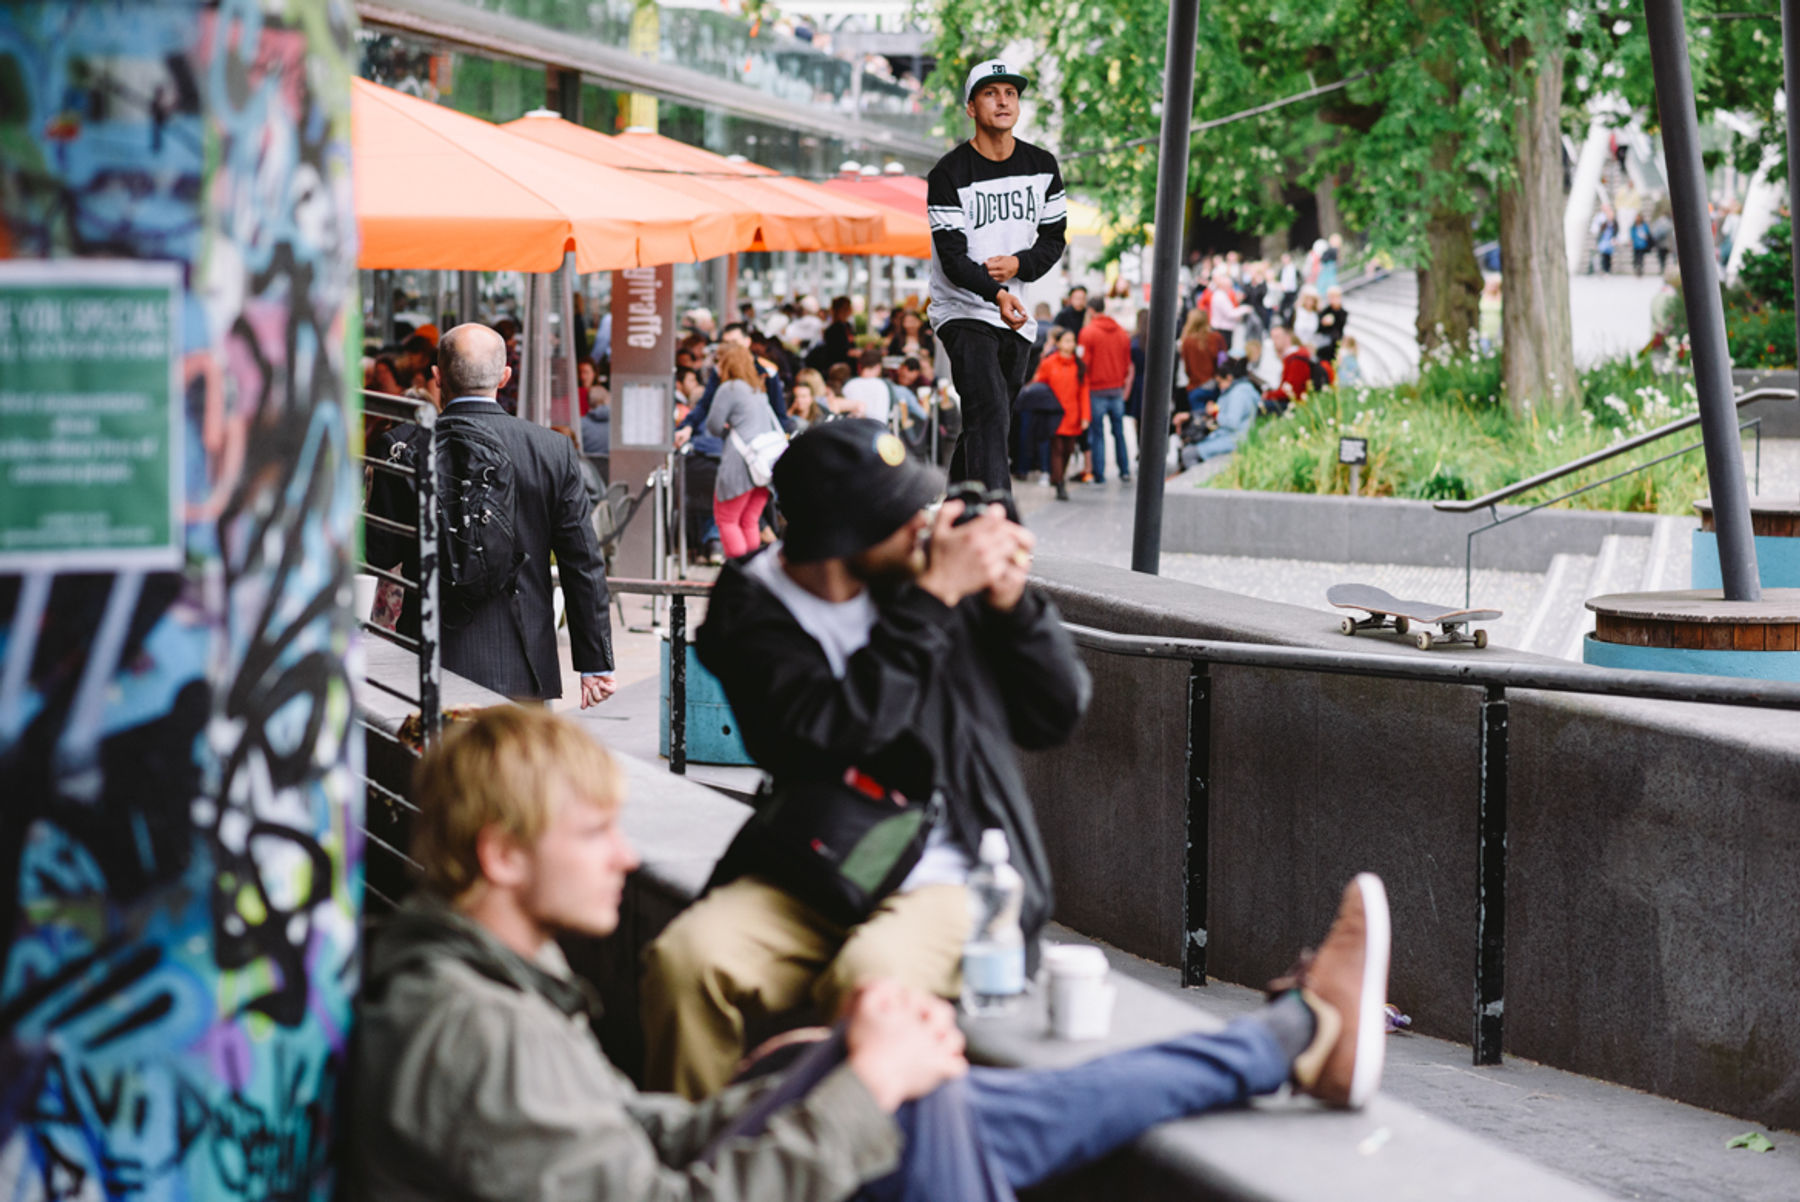 _IHC3260e-Madars-Apse-Antony-Lopez-DC-Special-Delivery-Skate-Tour-BTS-Southbank-London-May-2015-Photographer-Maksim-Kalanep